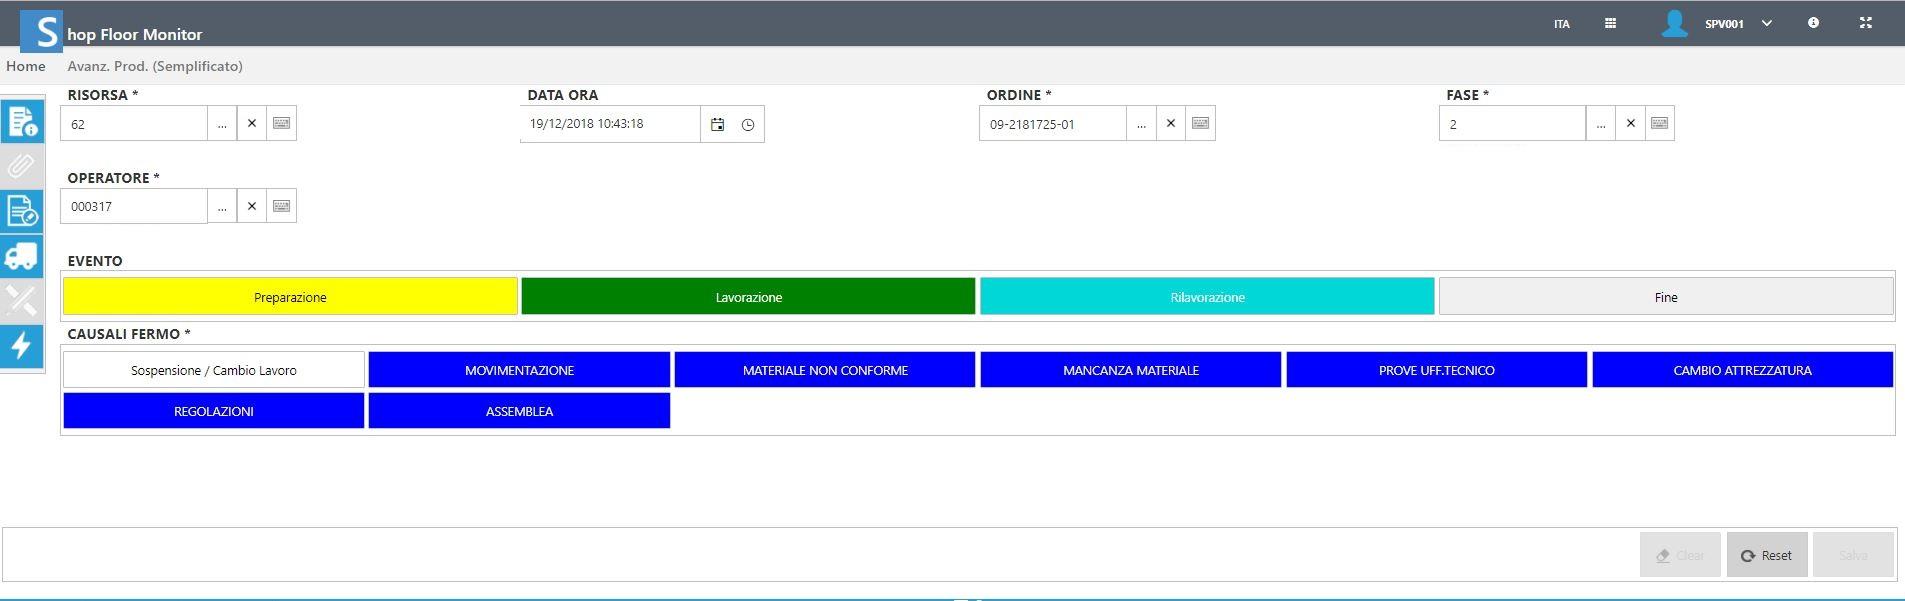 Una schermata del sistema MES in Nobili Spa